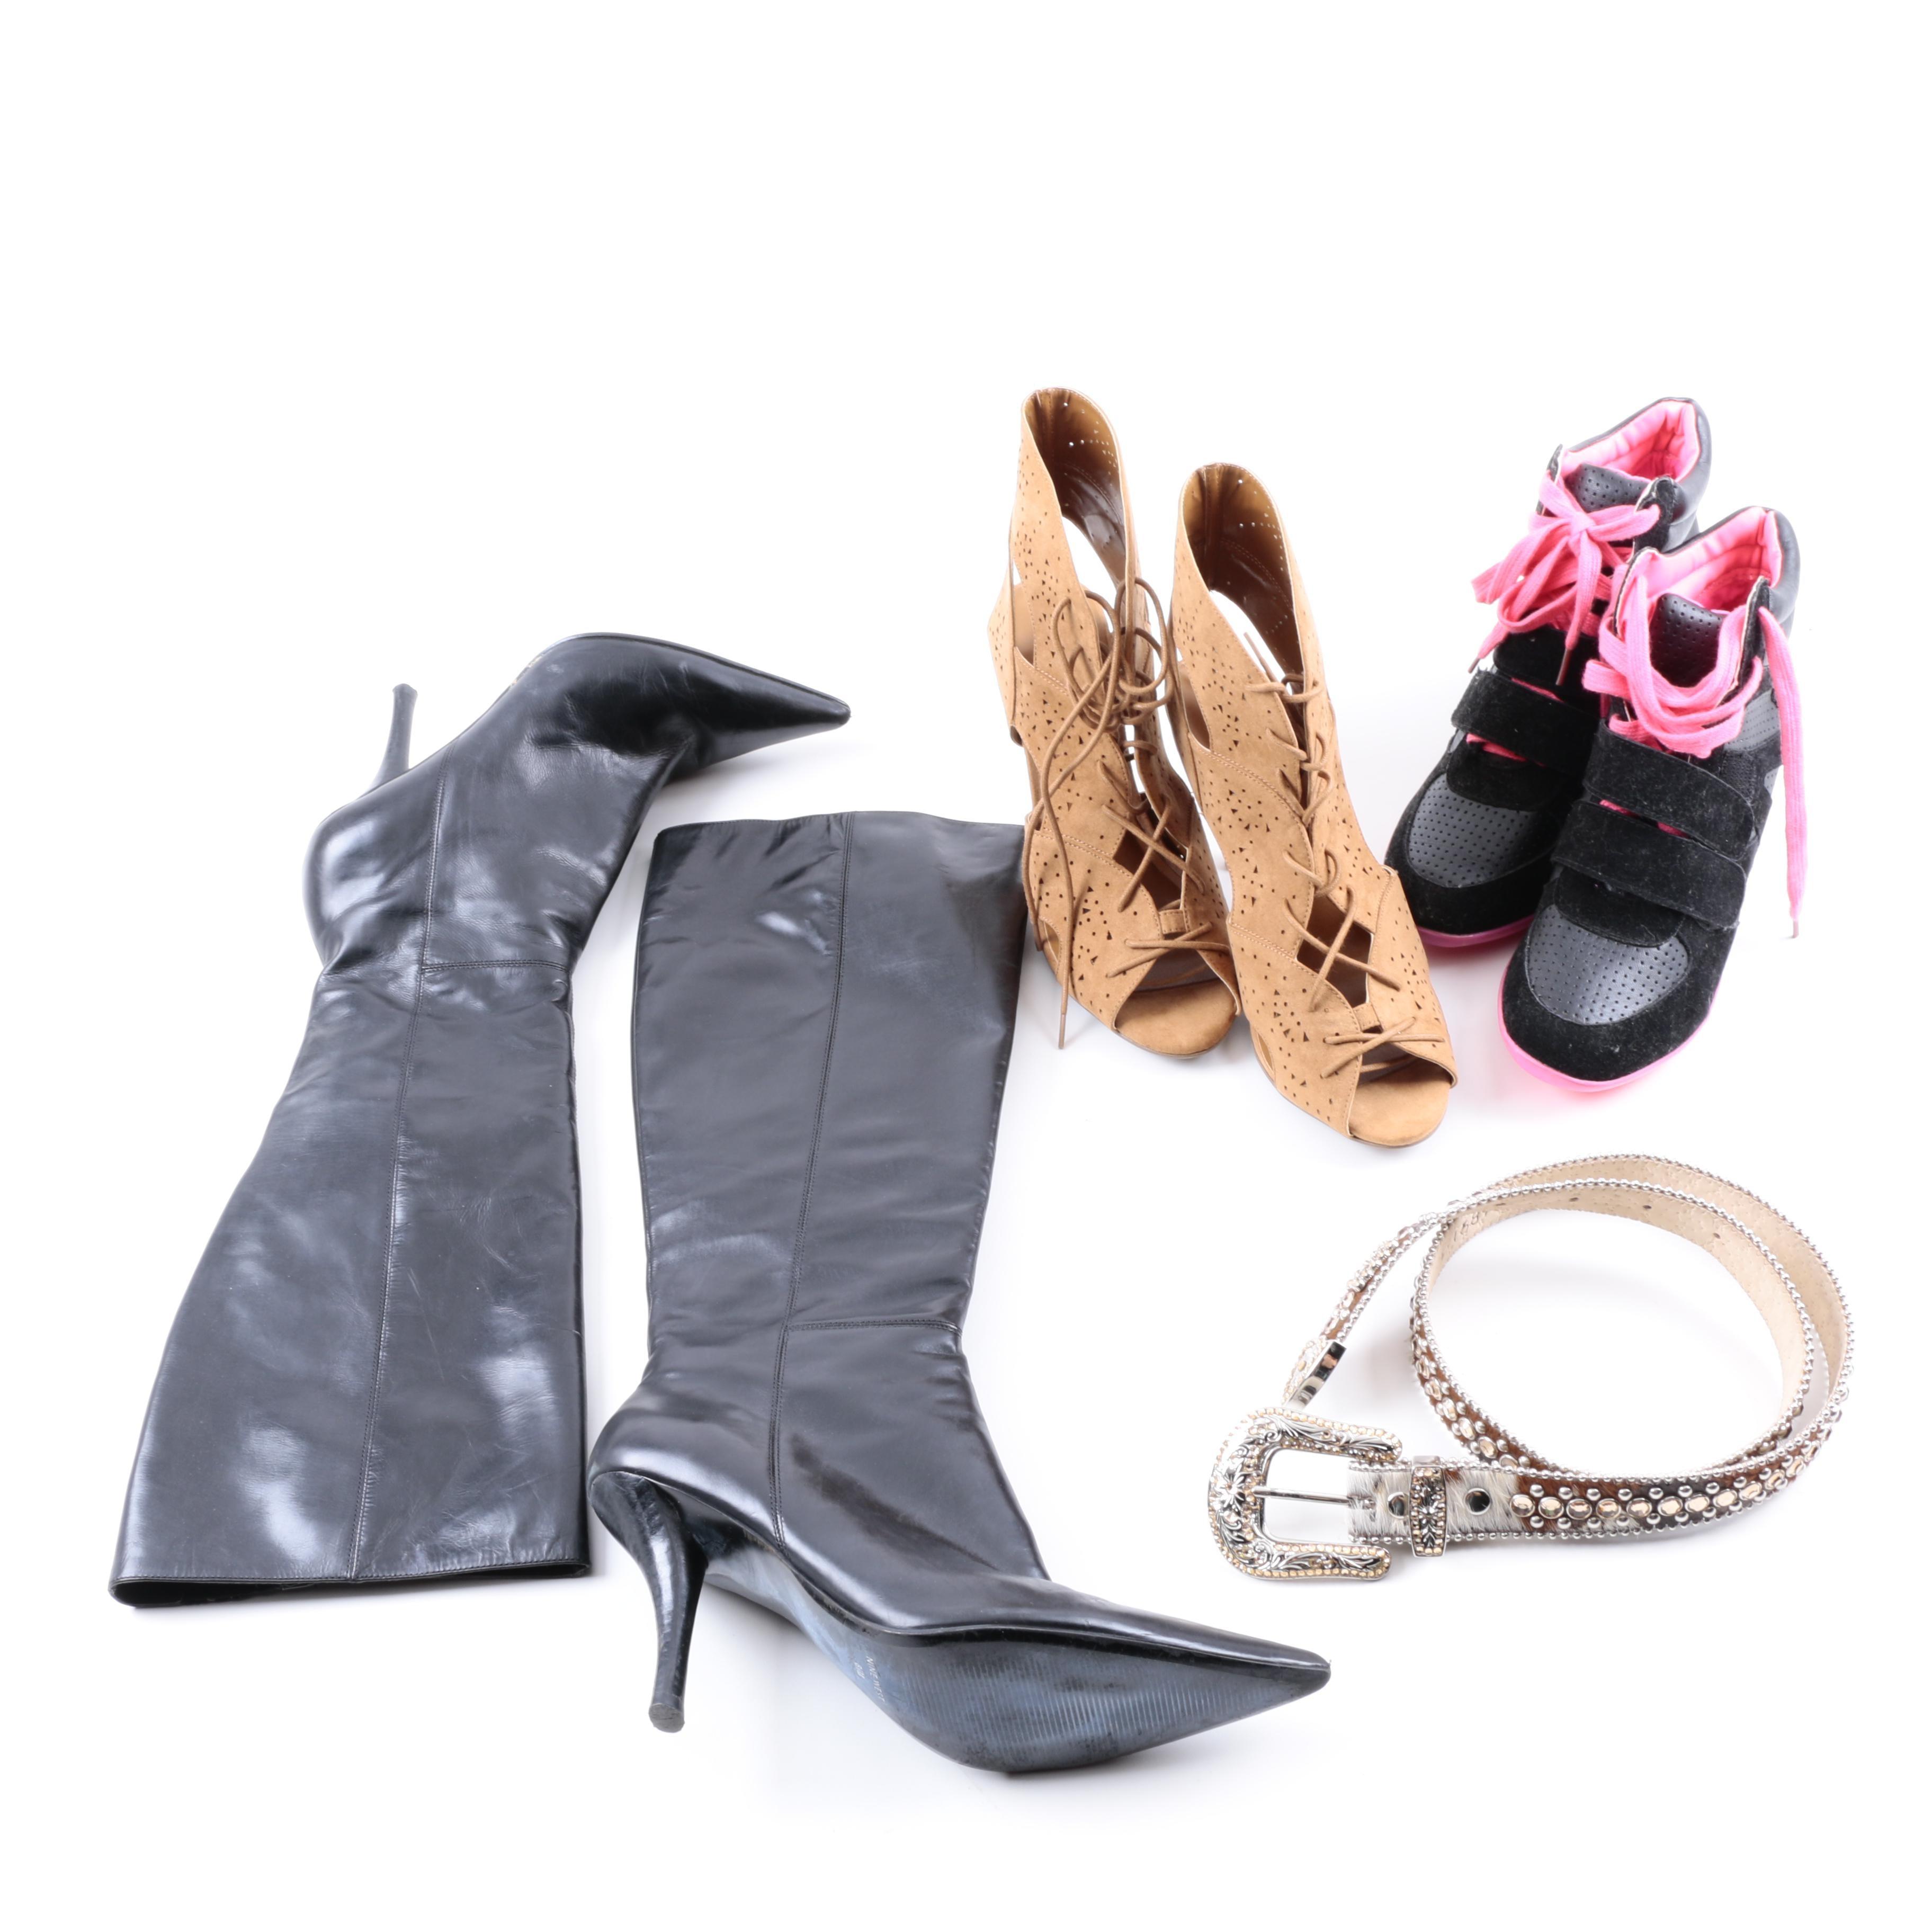 Women's Footwear and BB Simon Belt